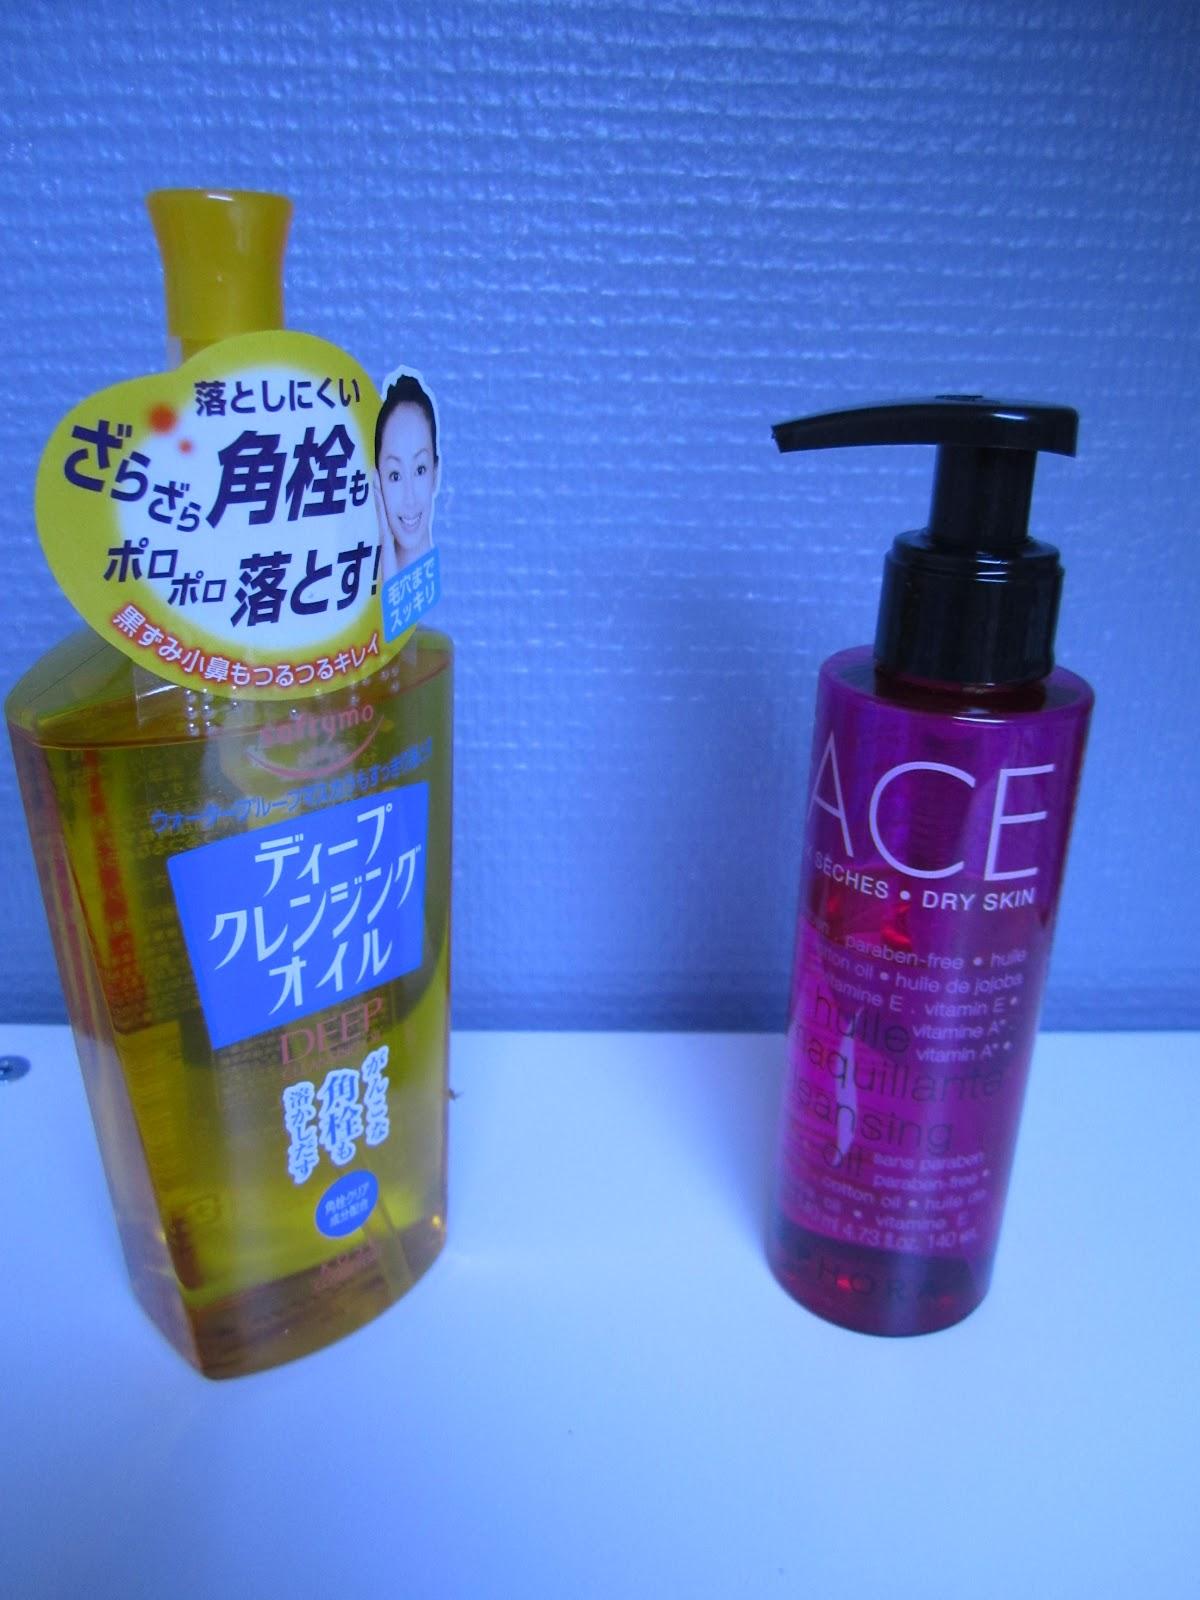 http://4.bp.blogspot.com/-glhPoEota7Q/T2o3E4FAF4I/AAAAAAAAARw/GokacuVAqnk/s1600/L%27huile+d%C3%A9maquillante+Kose+Softymo+Deep+Cleansing+Oil+VS+la+Sephora+FACE.jpg